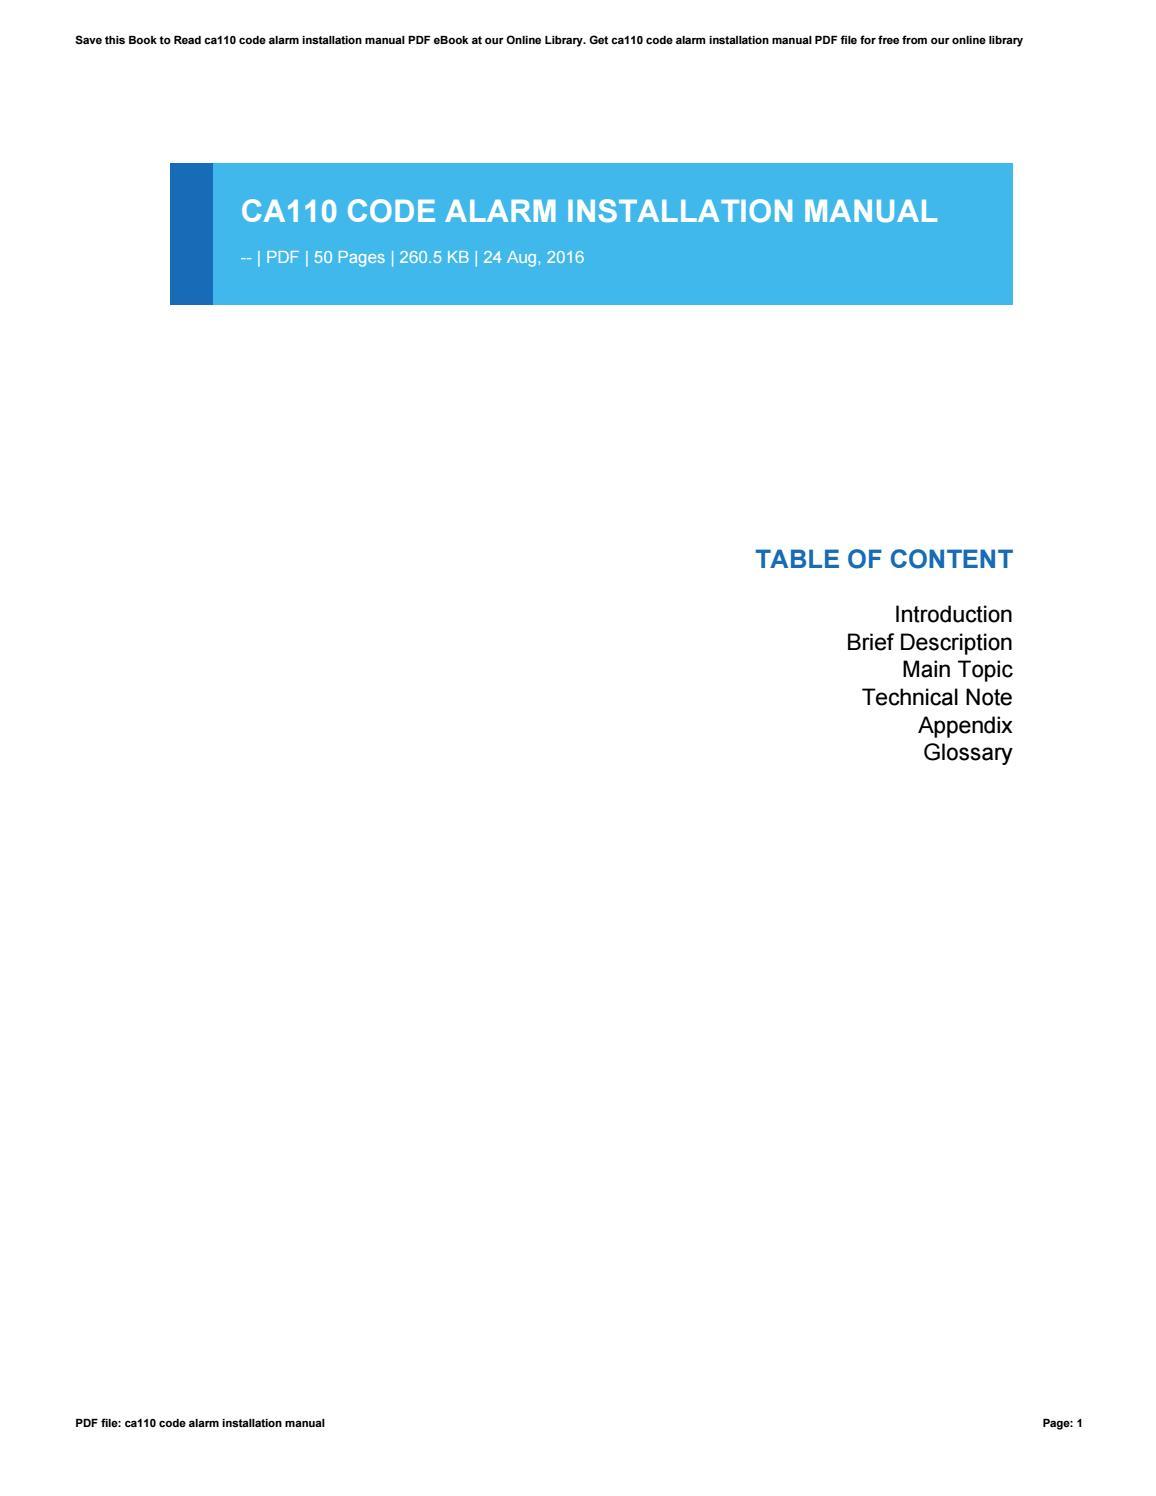 code alarm ca1051 wiring diagram healthy plate wrg 5568 ca110 installation manual 2019 ebook library